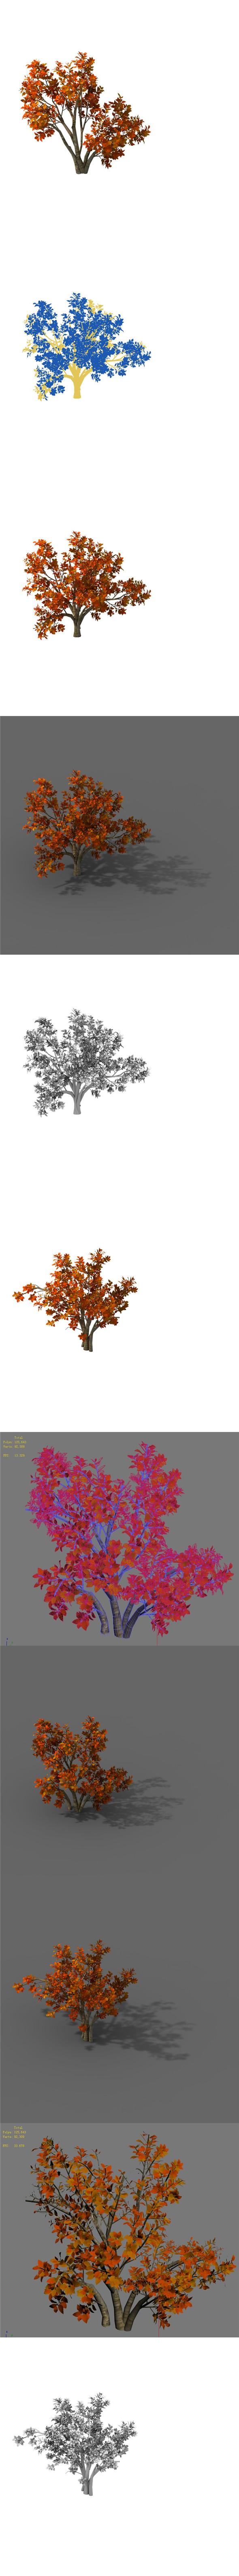 Plant - Shrub 01 - 3DOcean Item for Sale